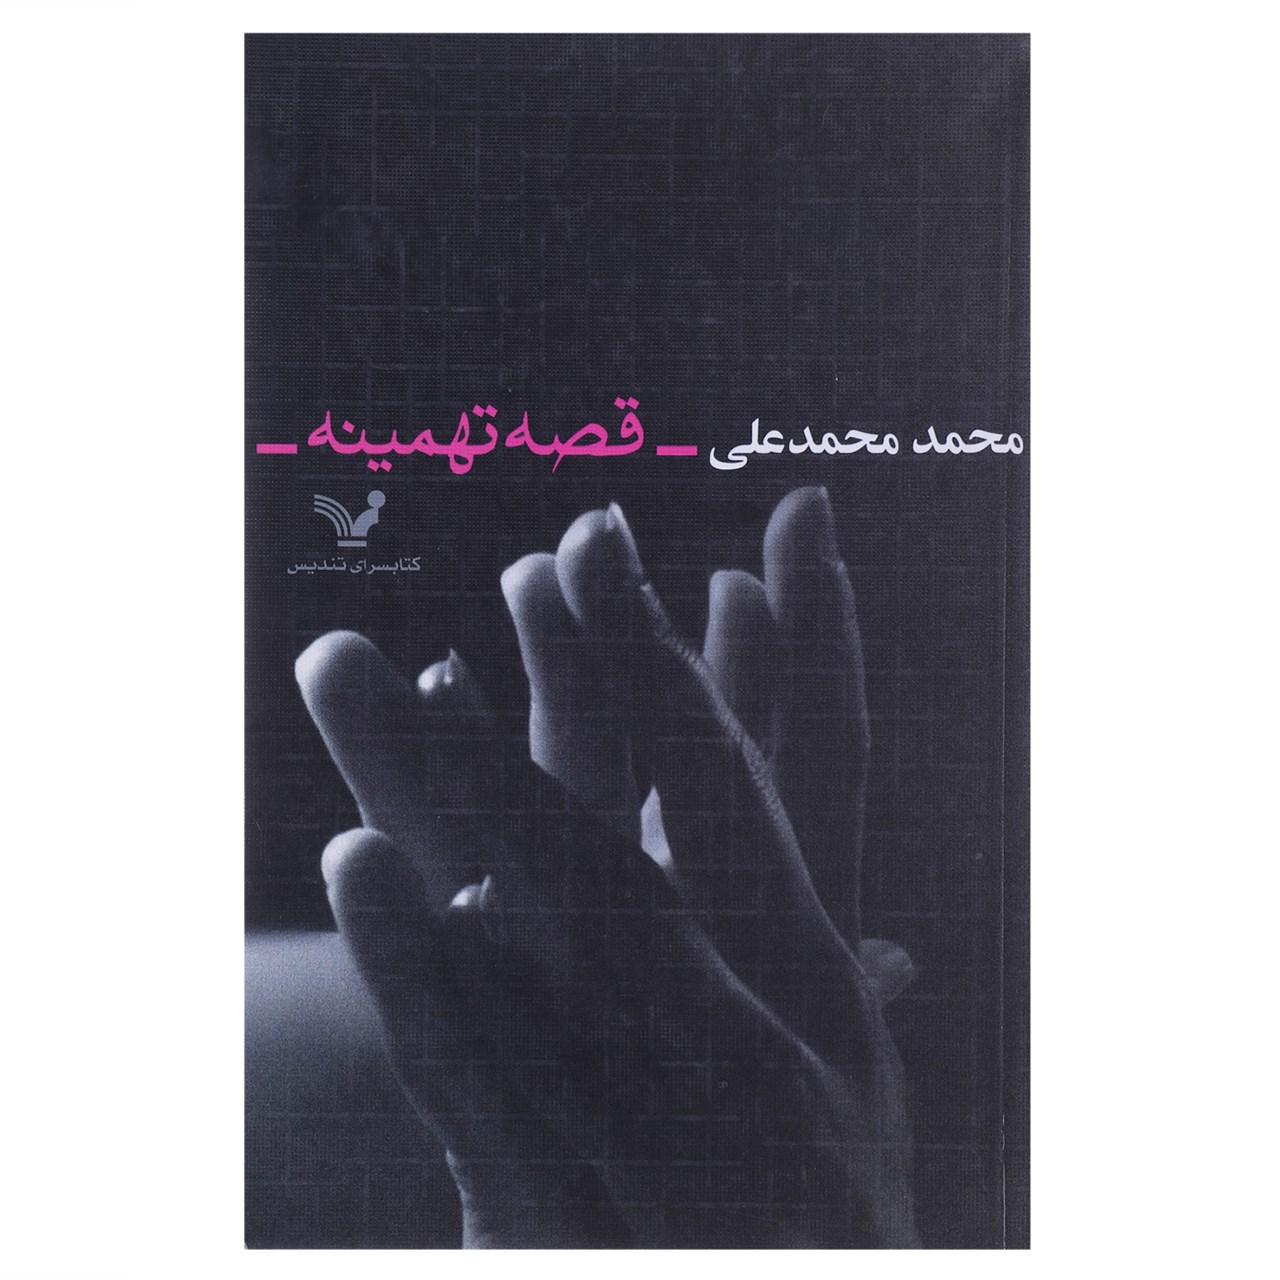 کتاب قصه تهمینه اثر محمد محمدعلی